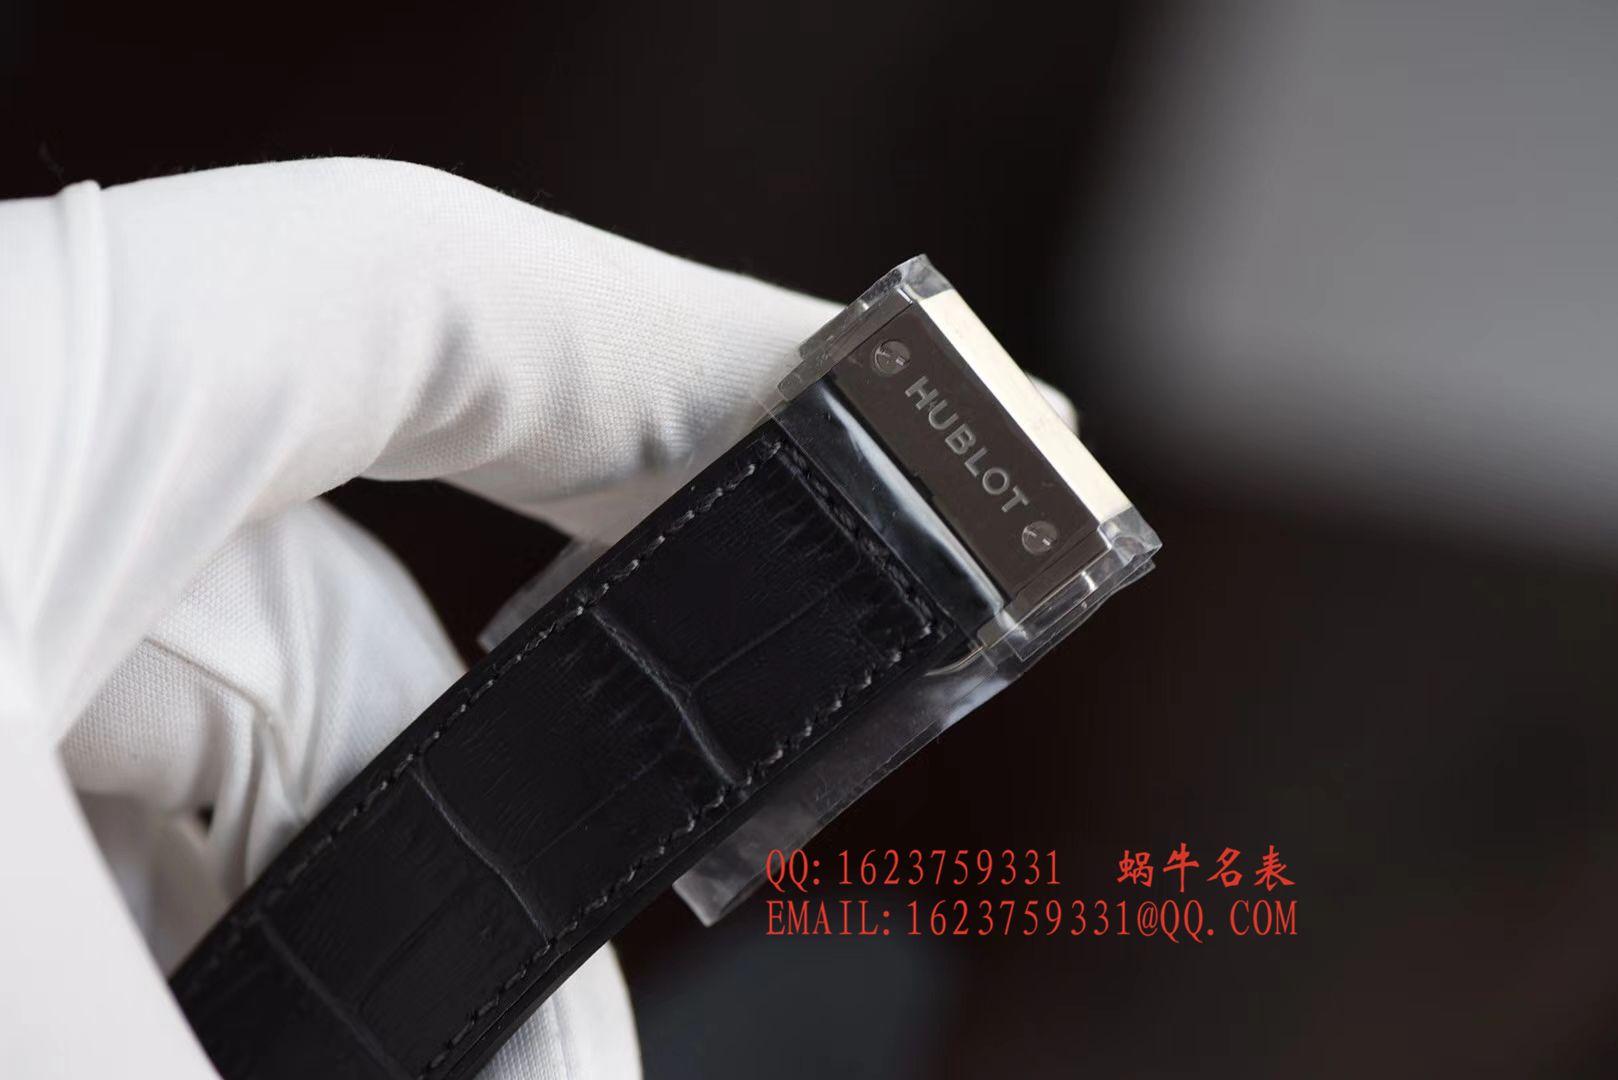 【JJ一比一超A高仿手 表】宇舶HUBLOT经典融合系列511.ZX.7070.LR腕表 / YB051